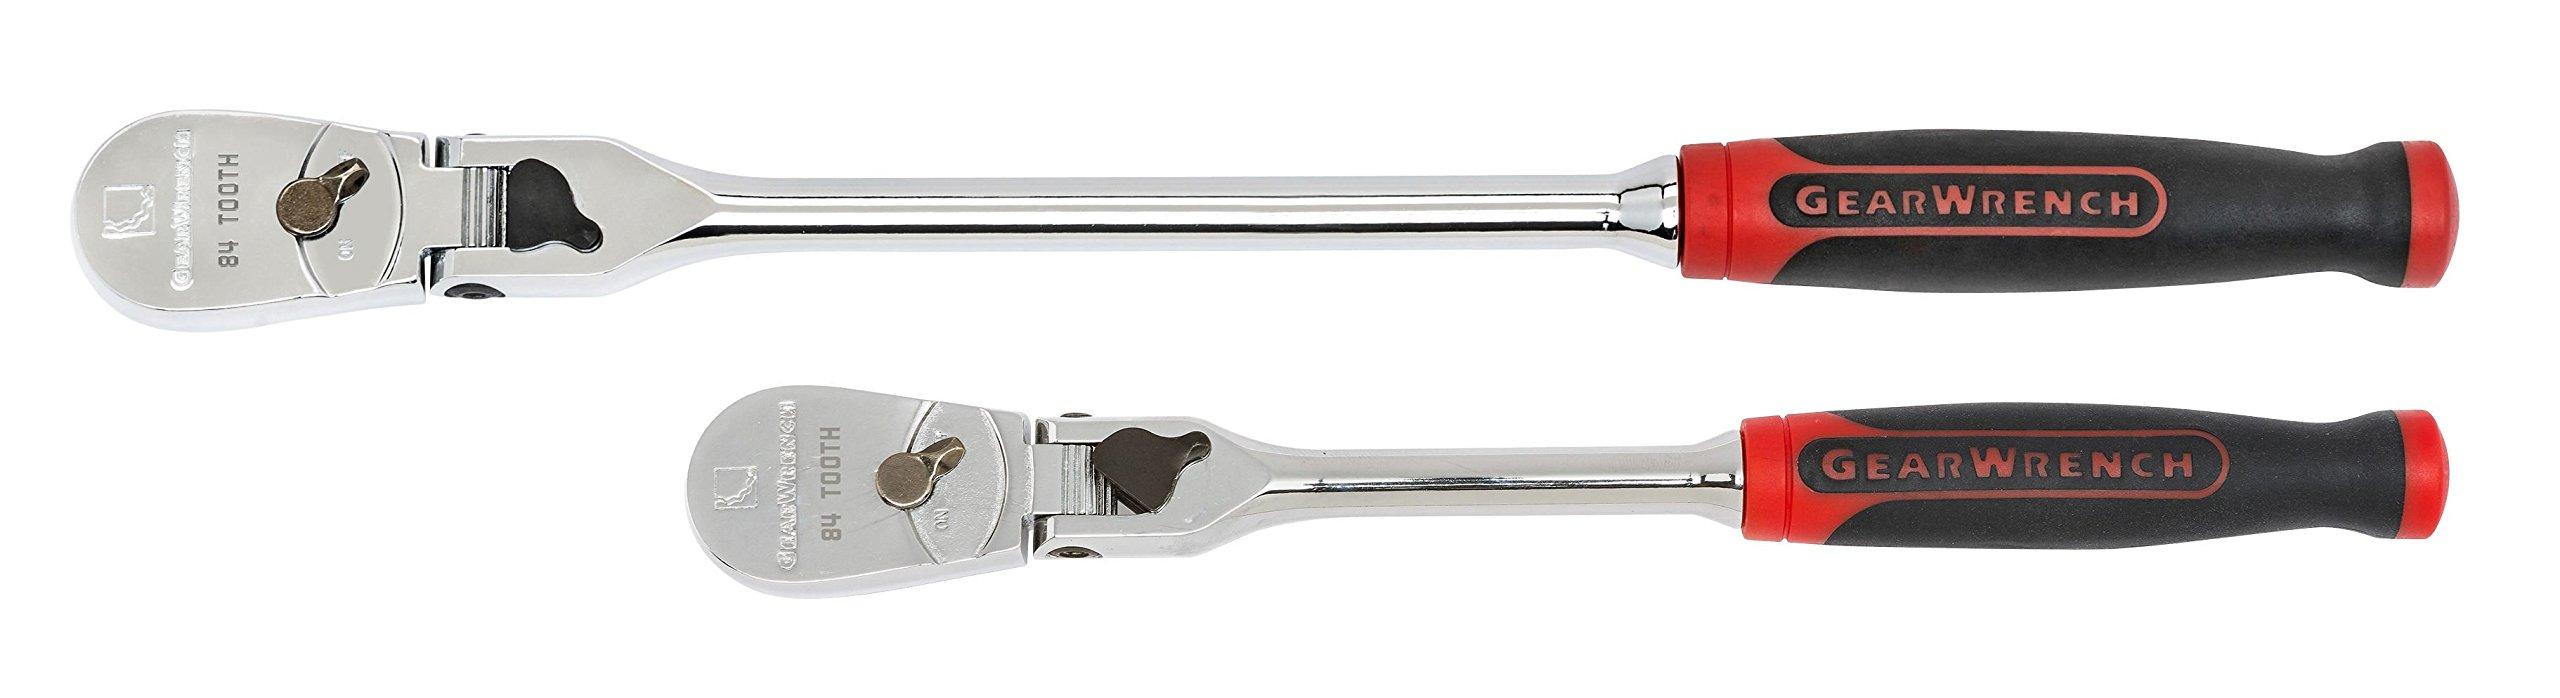 GEARWRENCH 81275 2 Pc. 1/4'' & 3/8'' Drive 84 Tooth Dual Material Locking Flex Head Teardrop Ratchet Set, Black